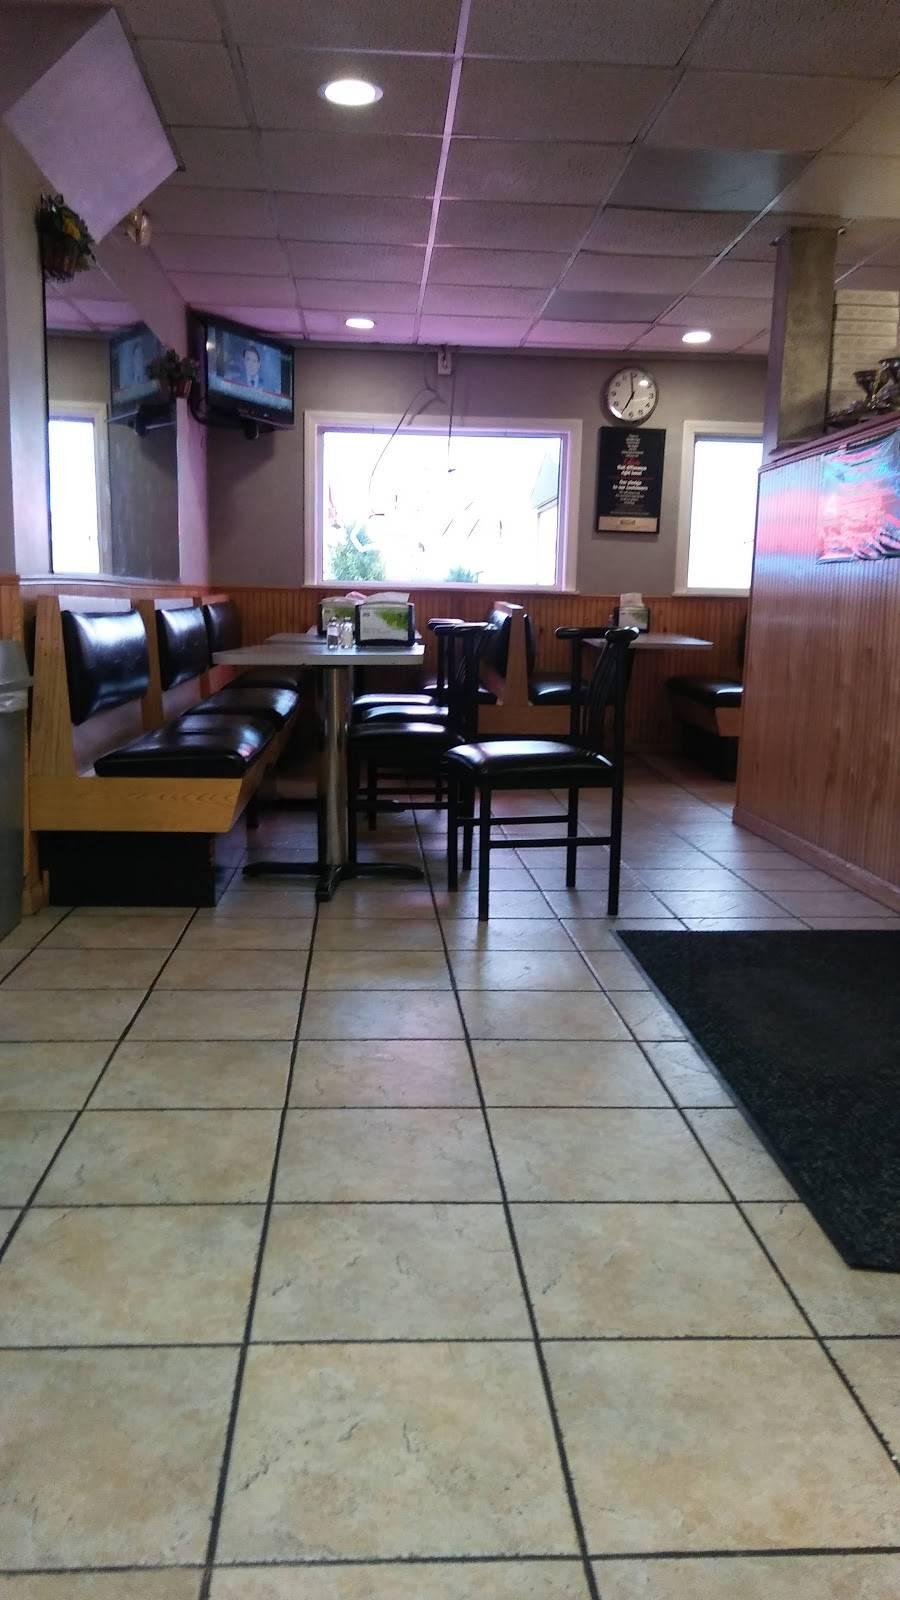 Dinos Pizzeria West Hartford | restaurant | 439 New Park Ave, West Hartford, CT 06107, USA | 8602364300 OR +1 860-236-4300